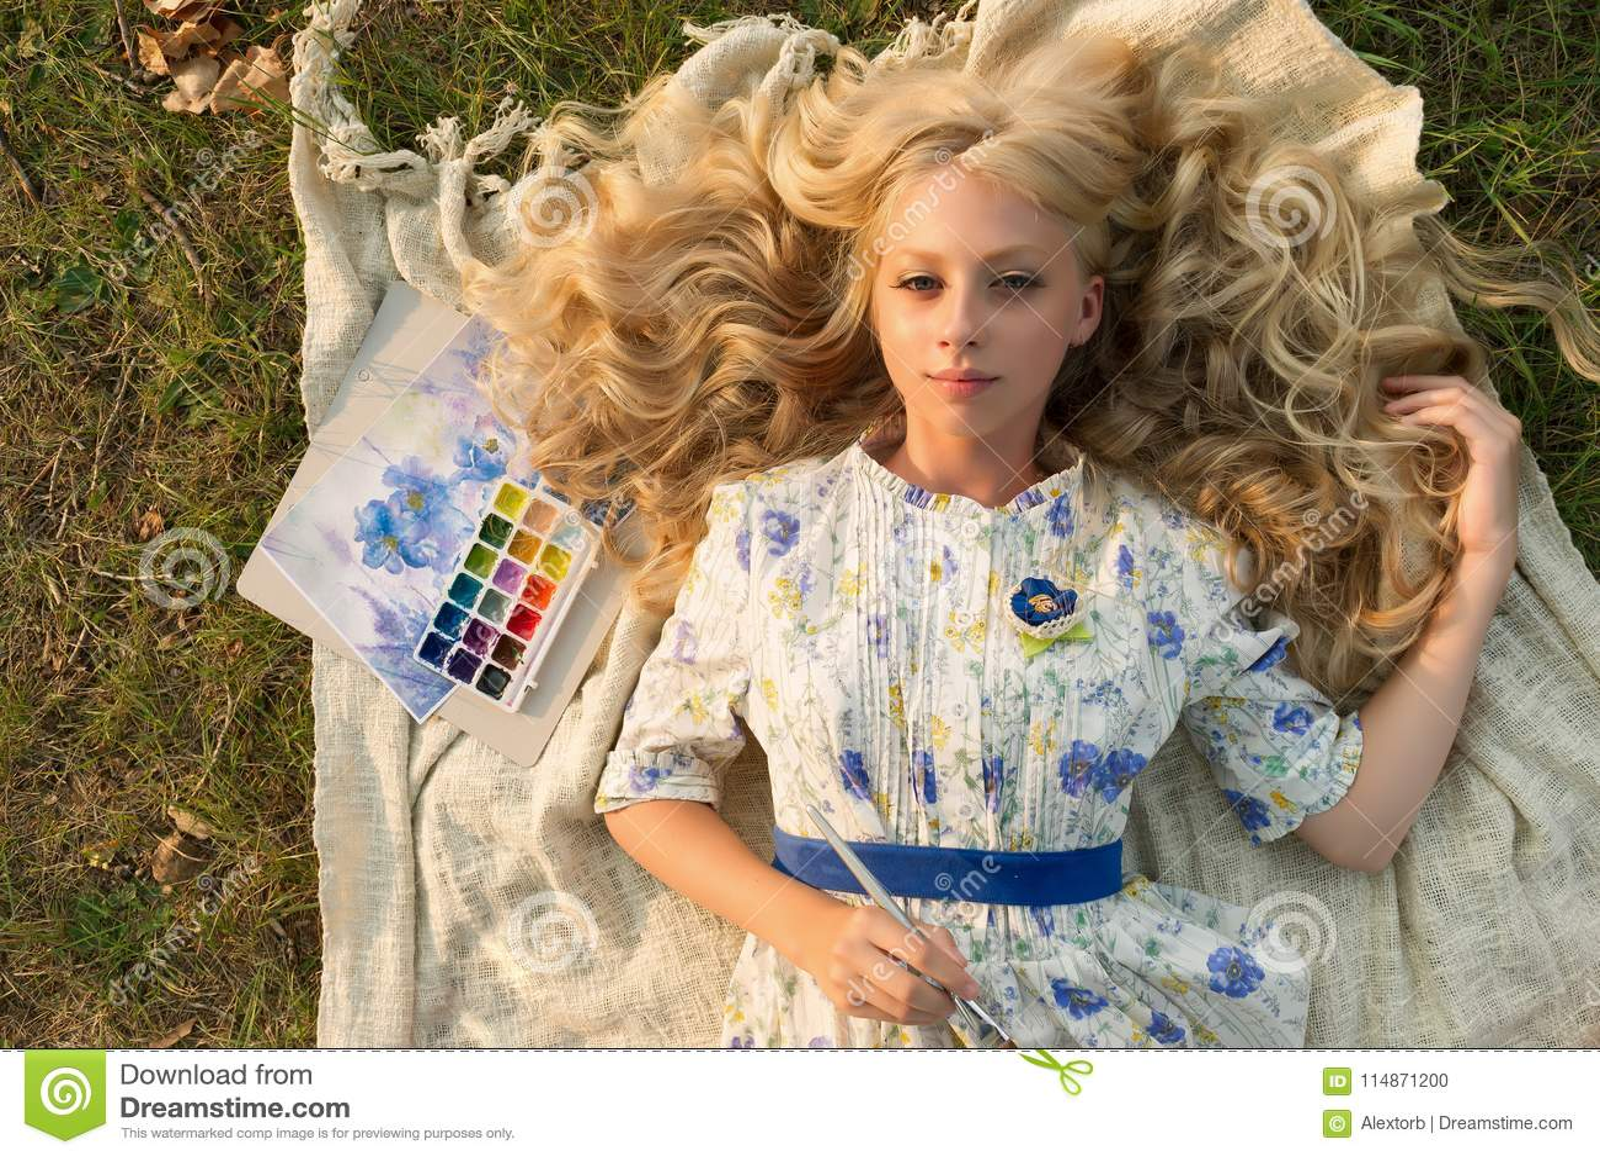 nu blondes adolescence